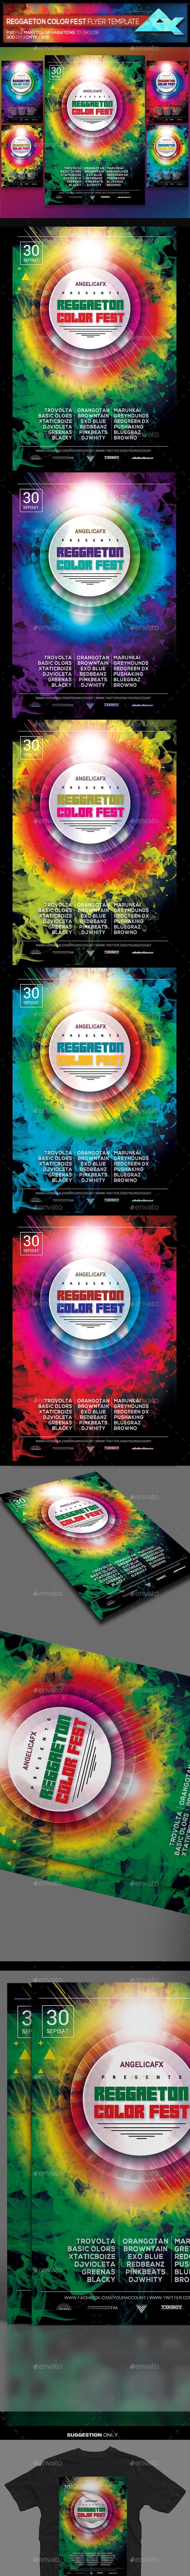 Reggaeton Summer Fest Flyer Template - Events Flyers